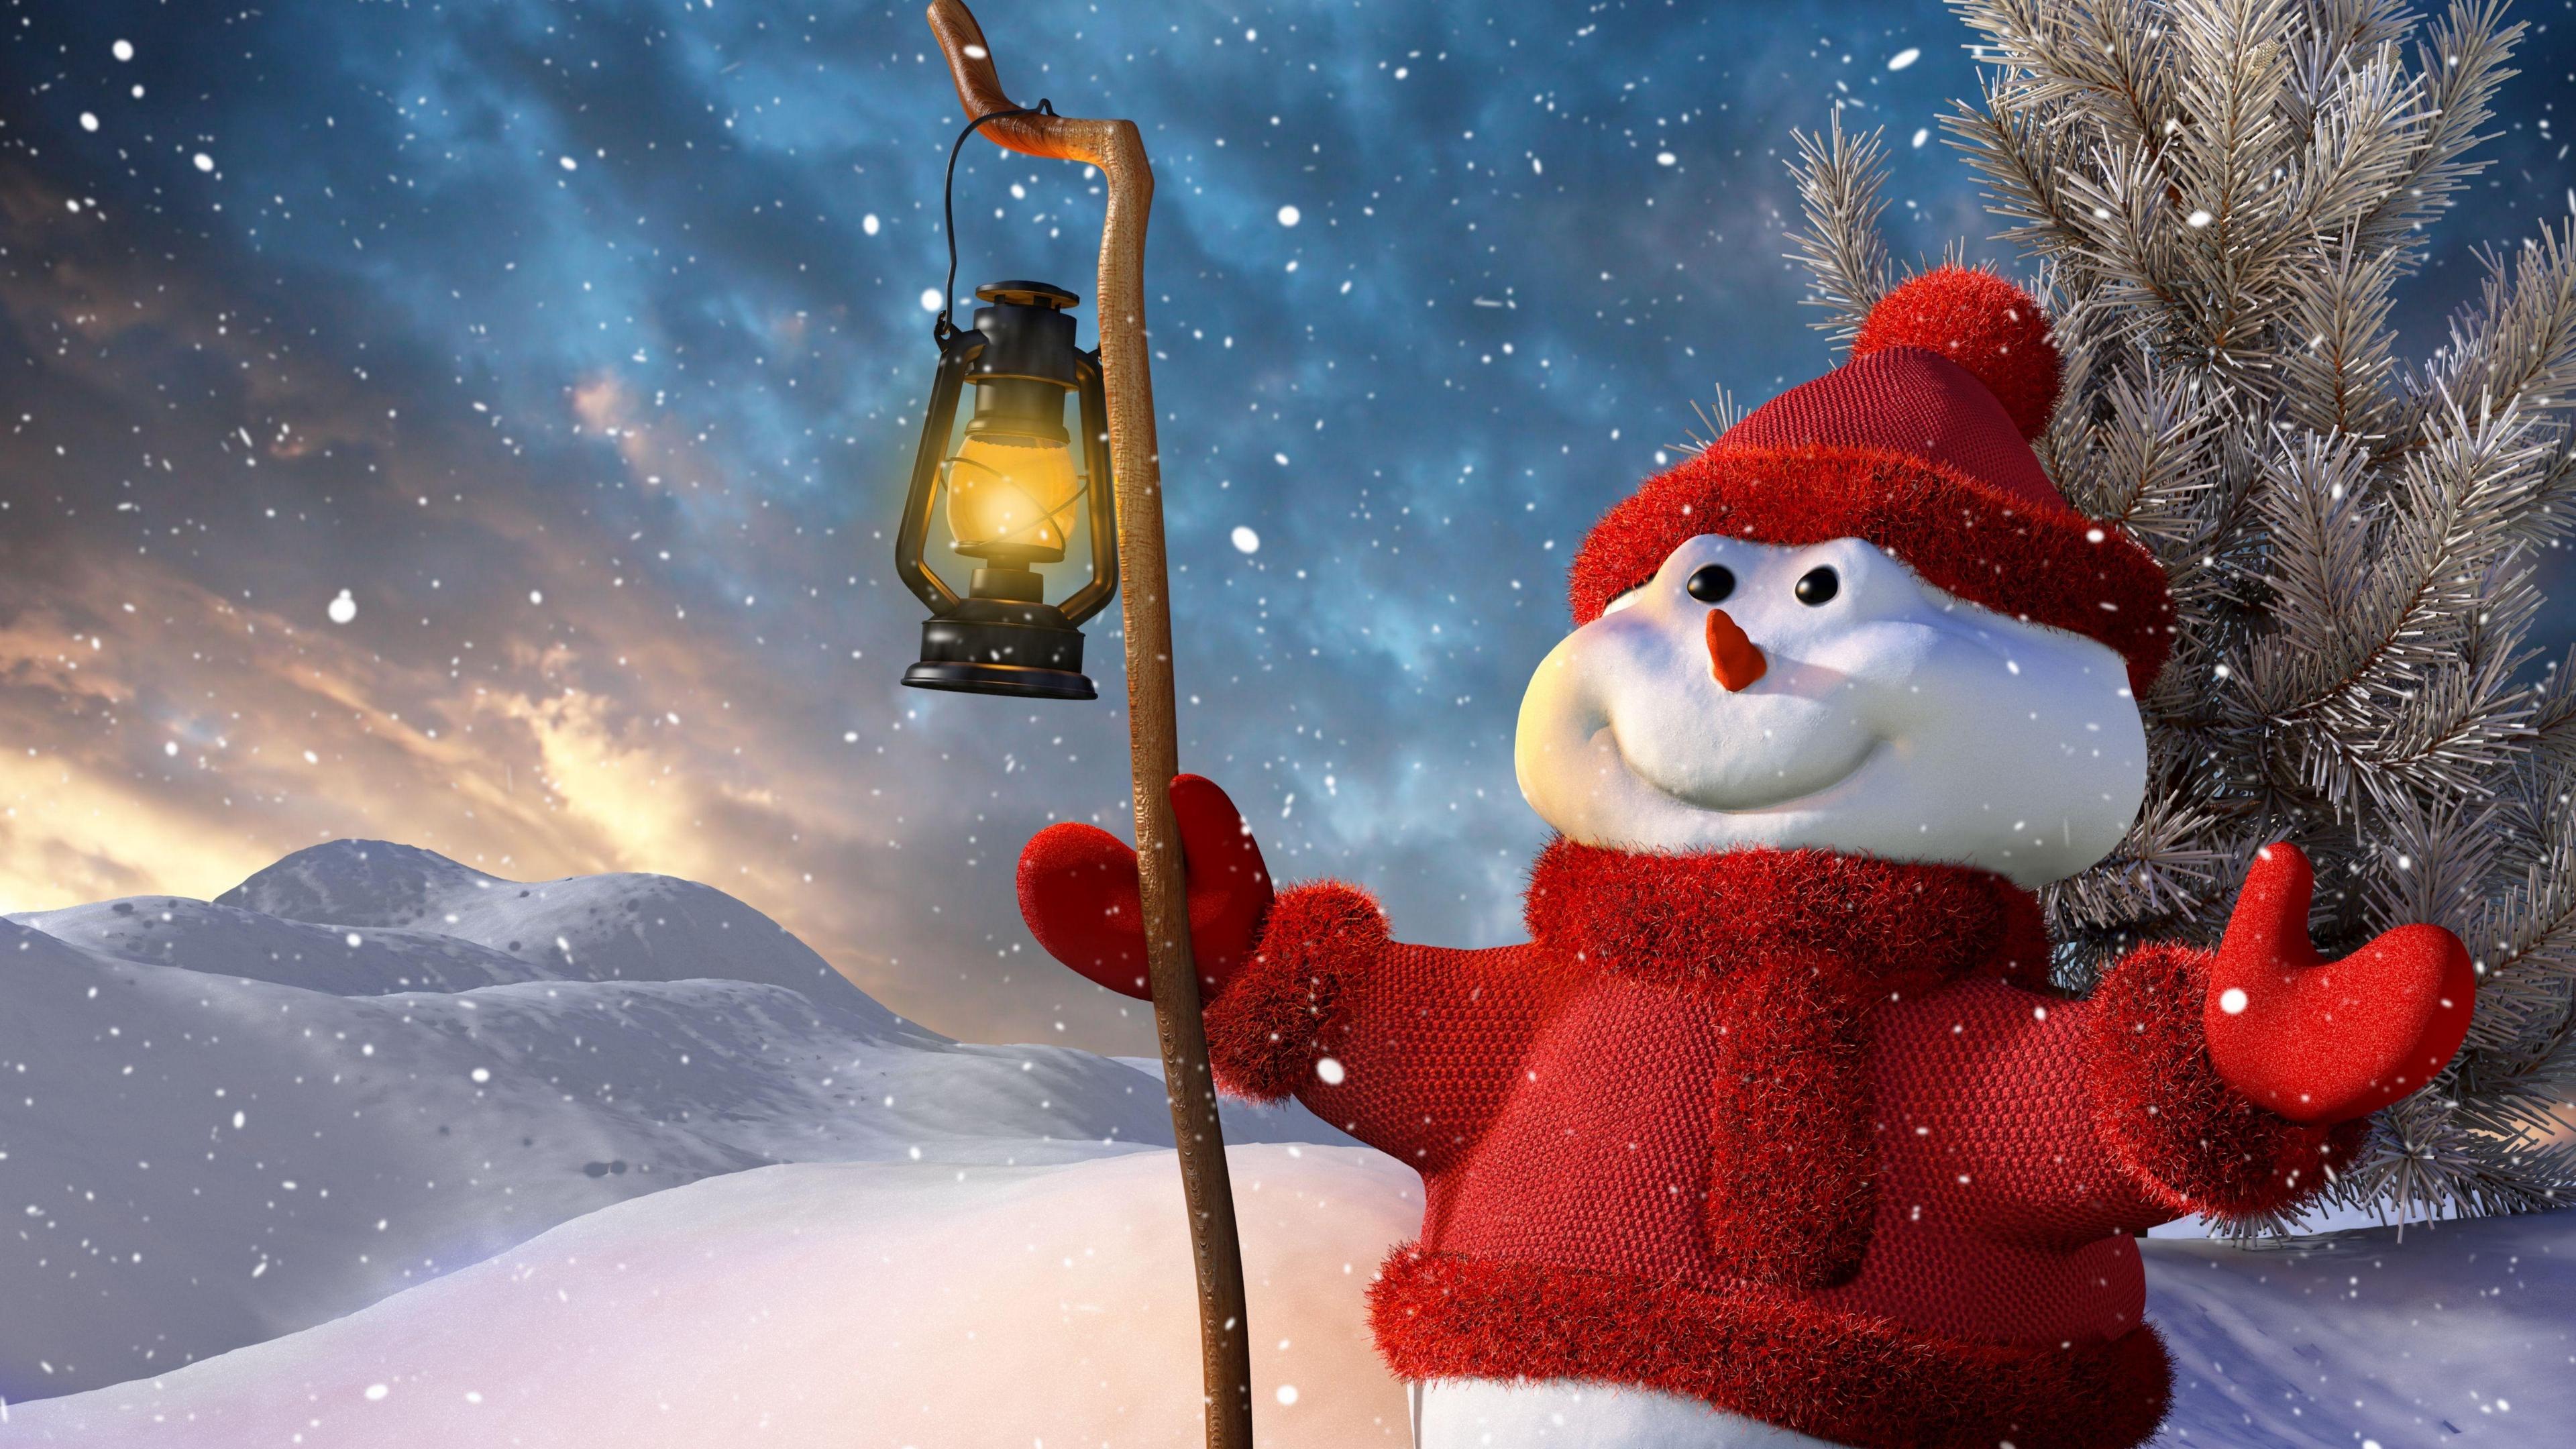 new year christmas snowman lamp tree snow smiling 4k 1538345340 - new year, christmas, snowman, lamp, tree, snow, smiling 4k - Snowman, new year, Christmas